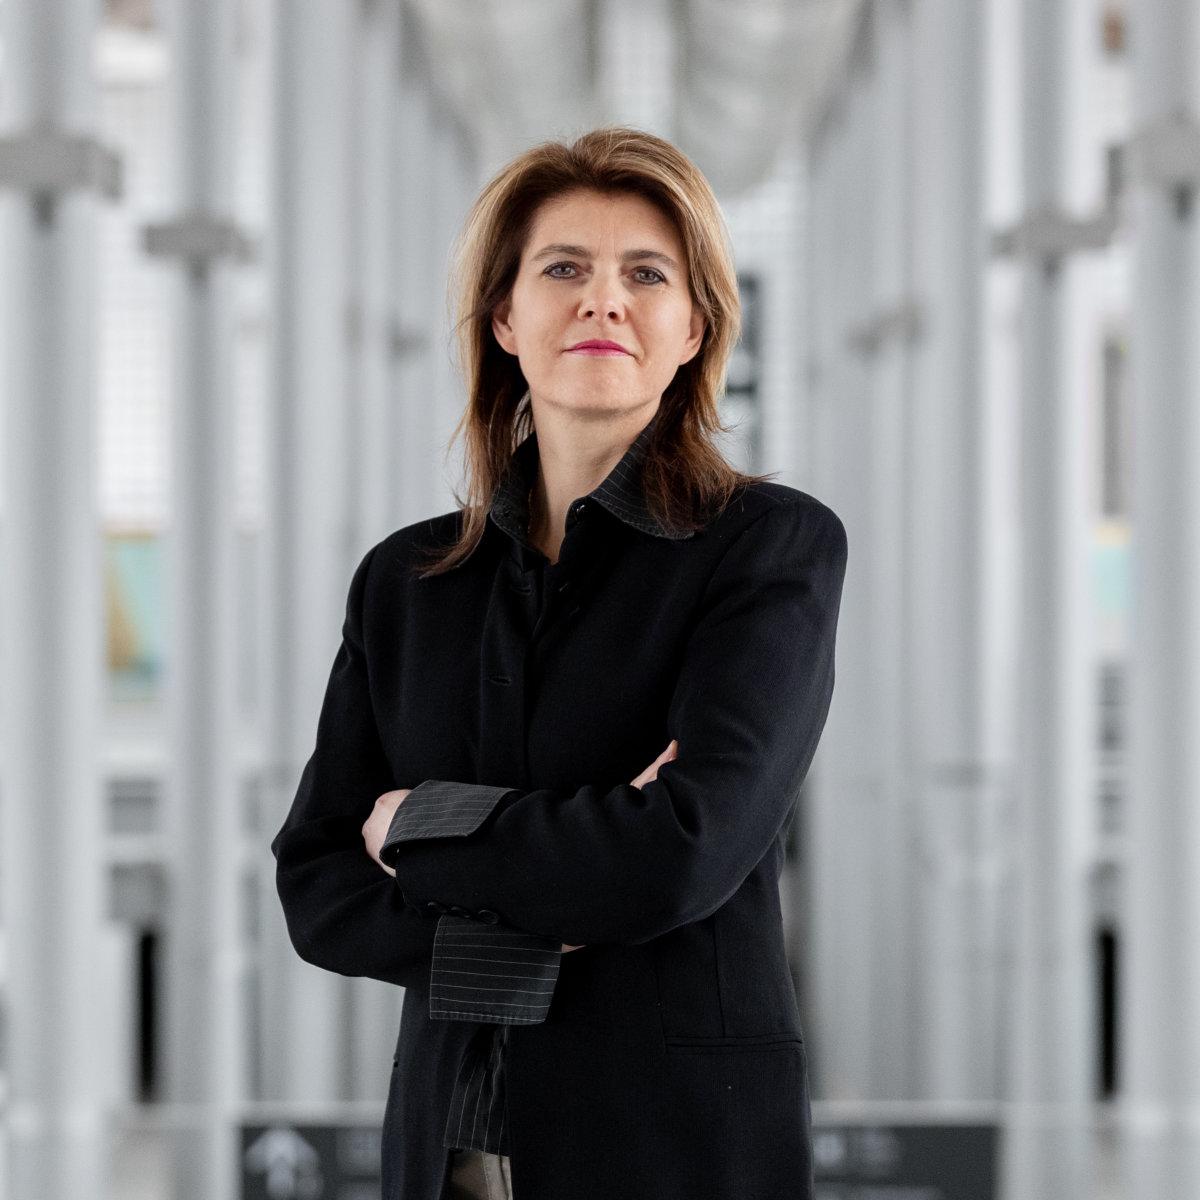 Rosmarie Schweigkofler